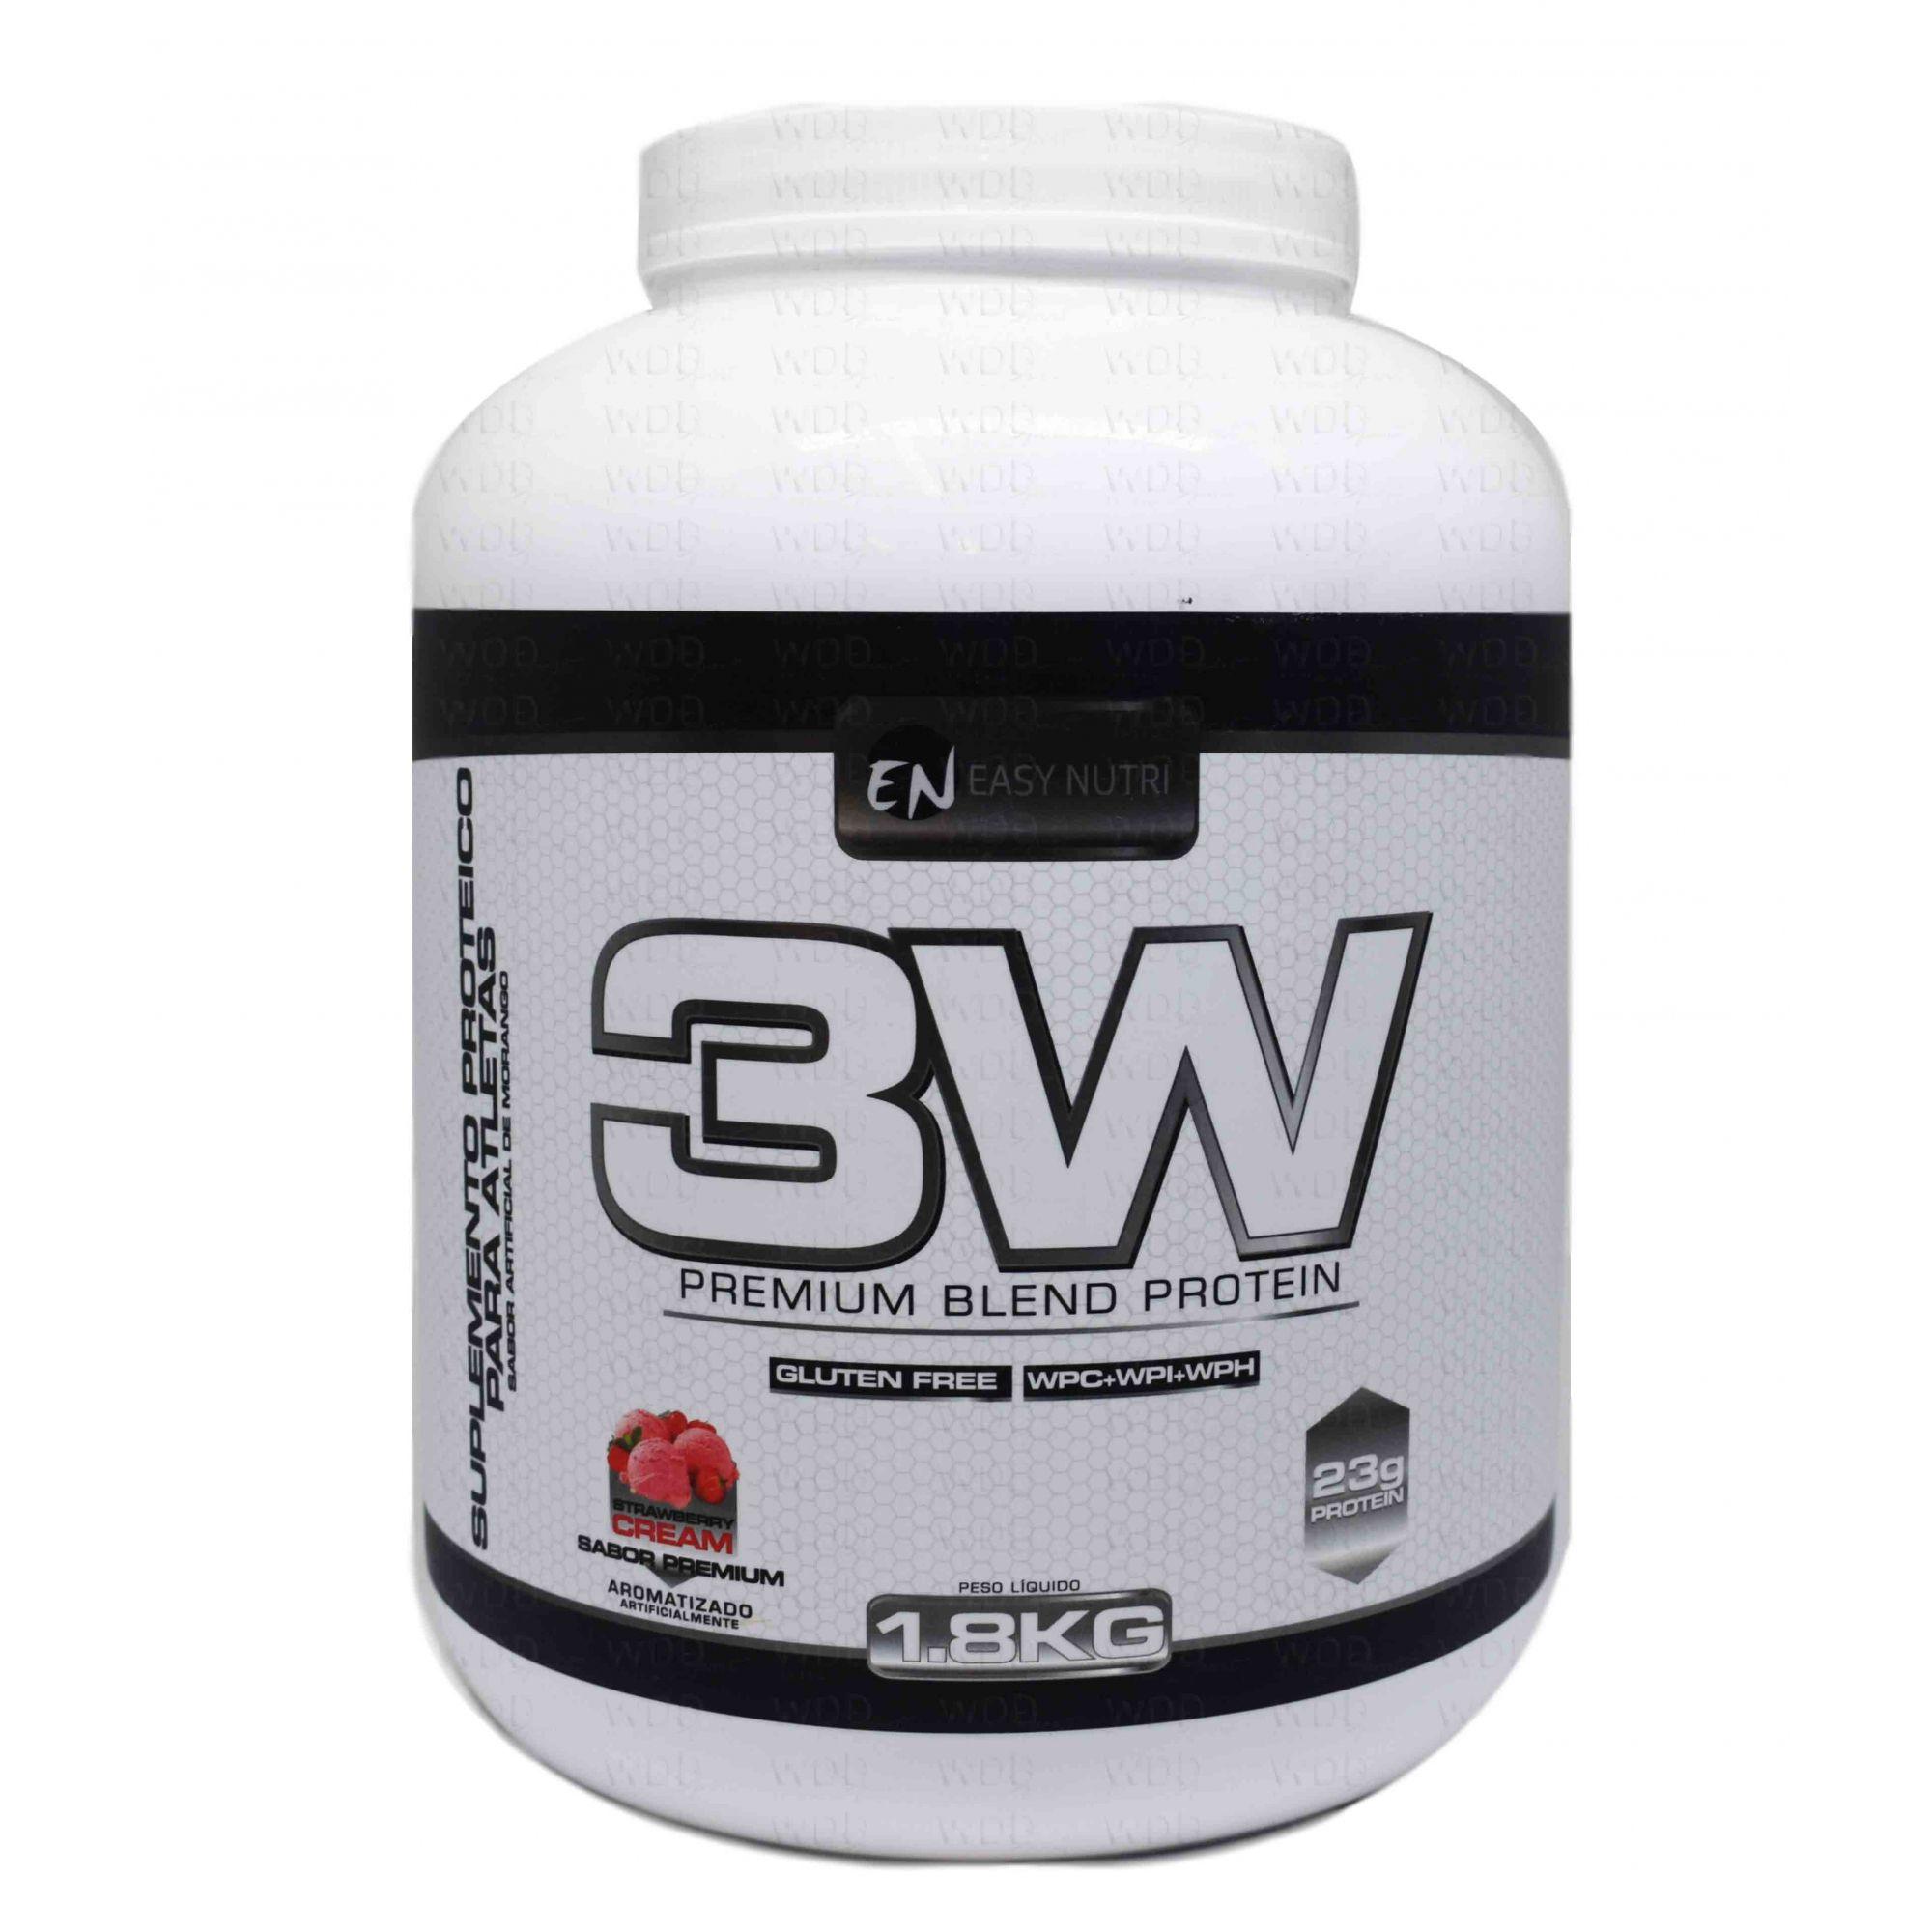 3W Premium Blend Protein 1,8kg Easy Nutri